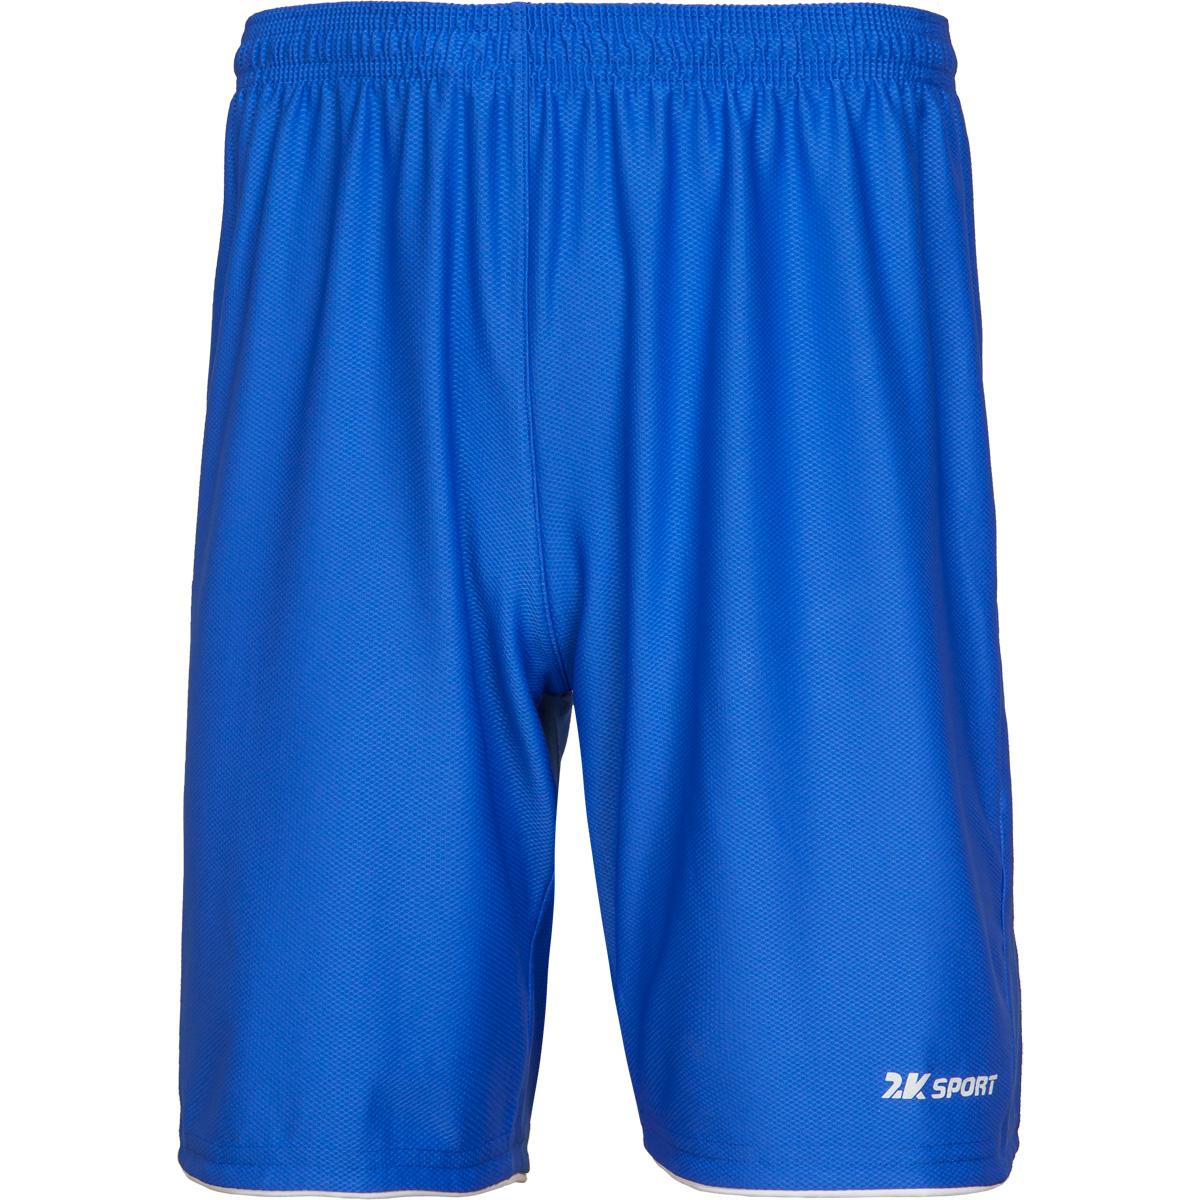 Шорты мужские 2K Sport Champion II, цвет: синий, белый. 120019. Размер XXL (54) шорты champion шорты